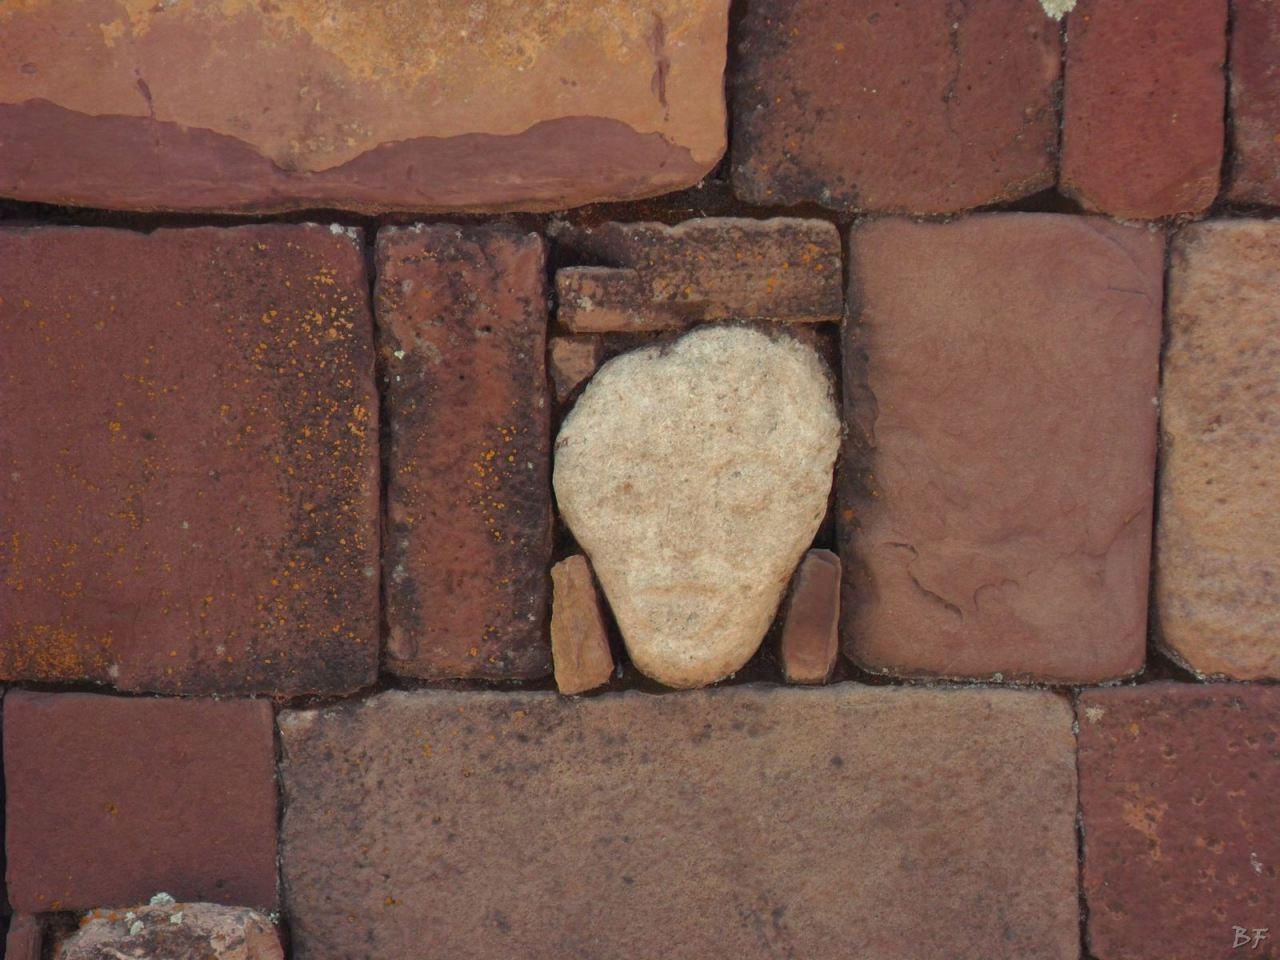 Sito-Megalitico-Piramide-Akapana-Kalasasaya-Menhir-Tiahuanaco-Bolivia-93